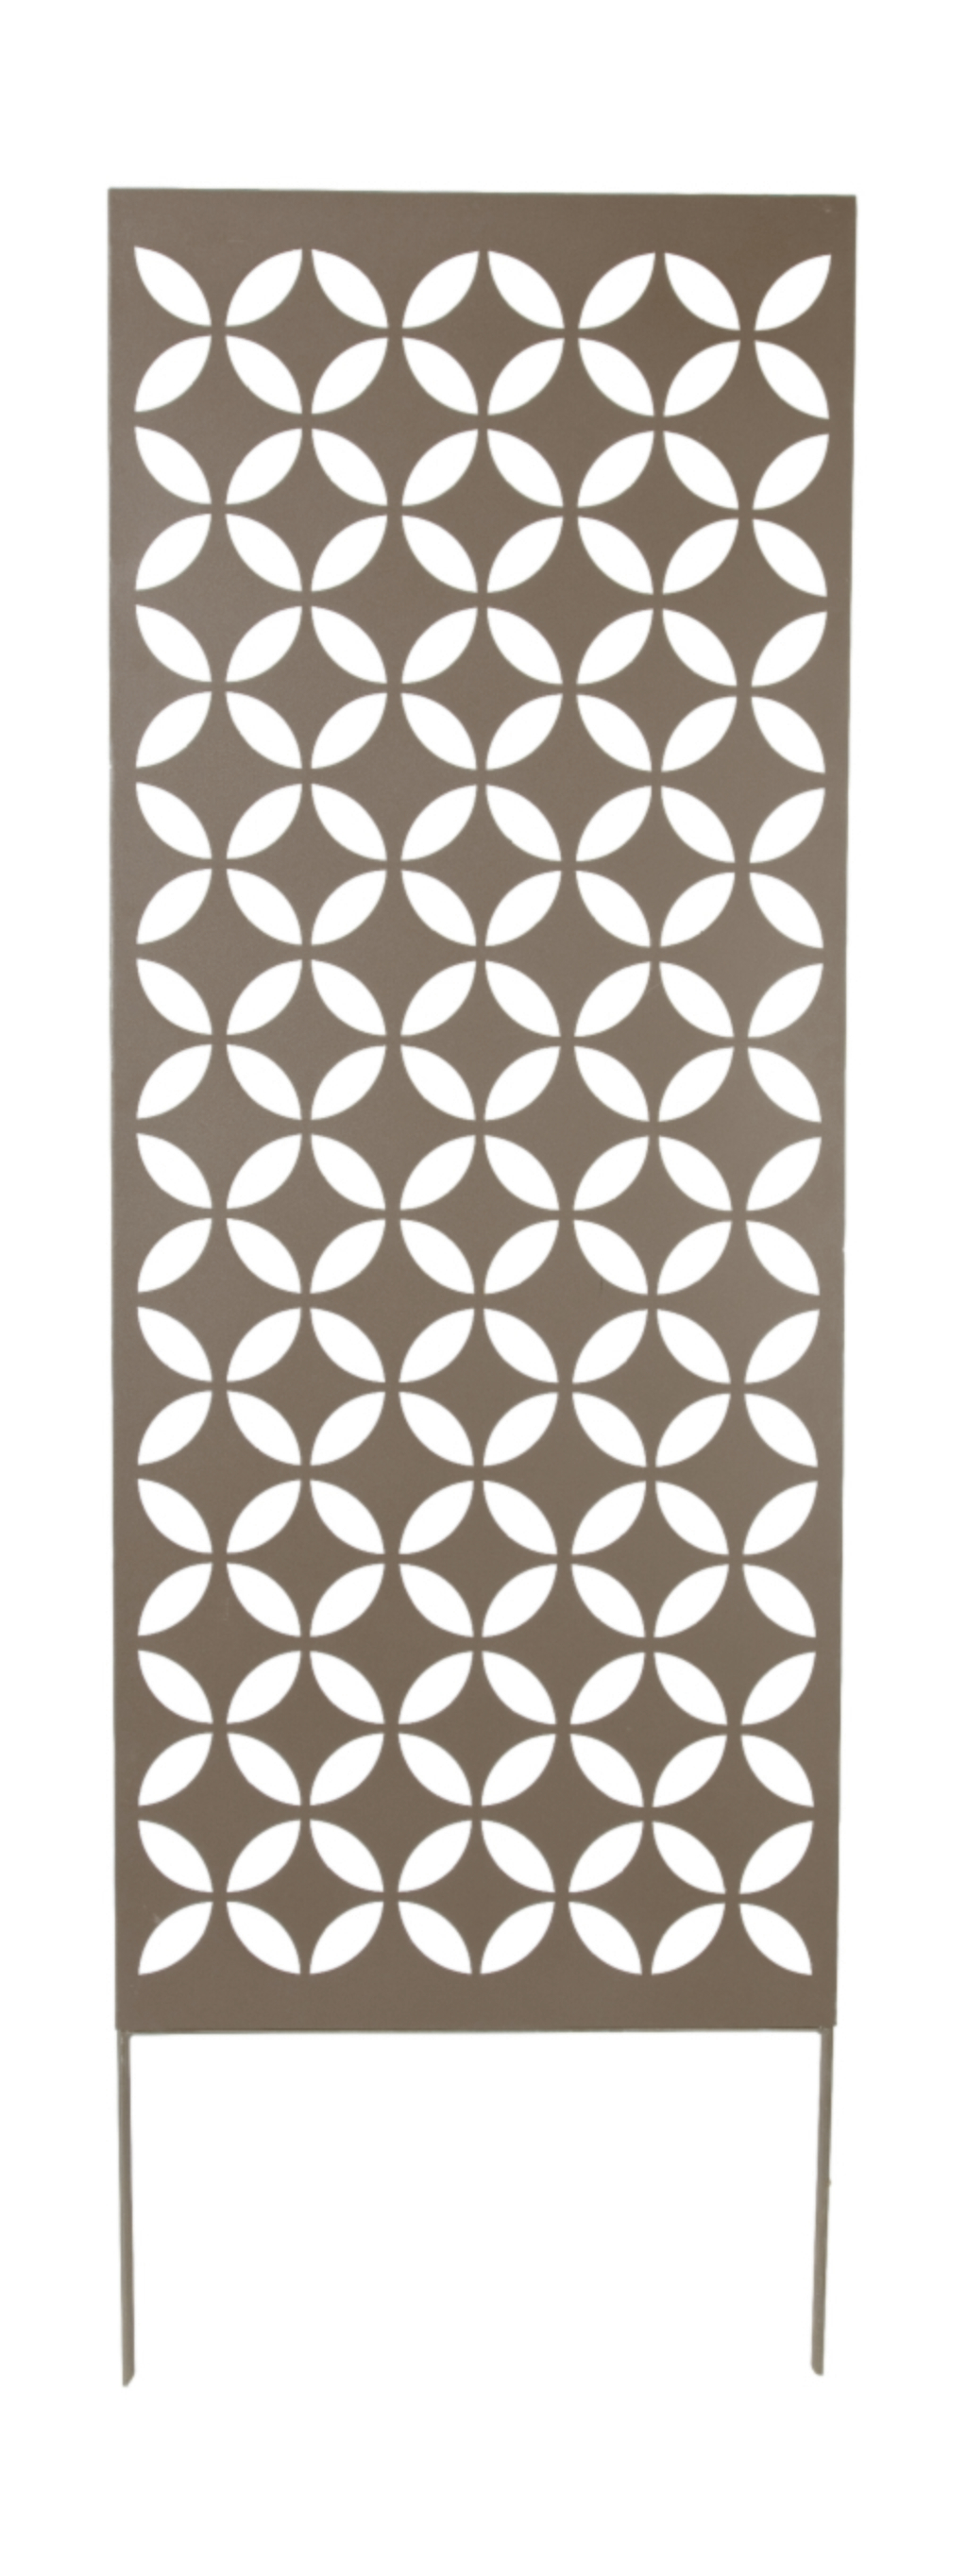 Panneaux en métal, avec motifs décoratifs - Nortene